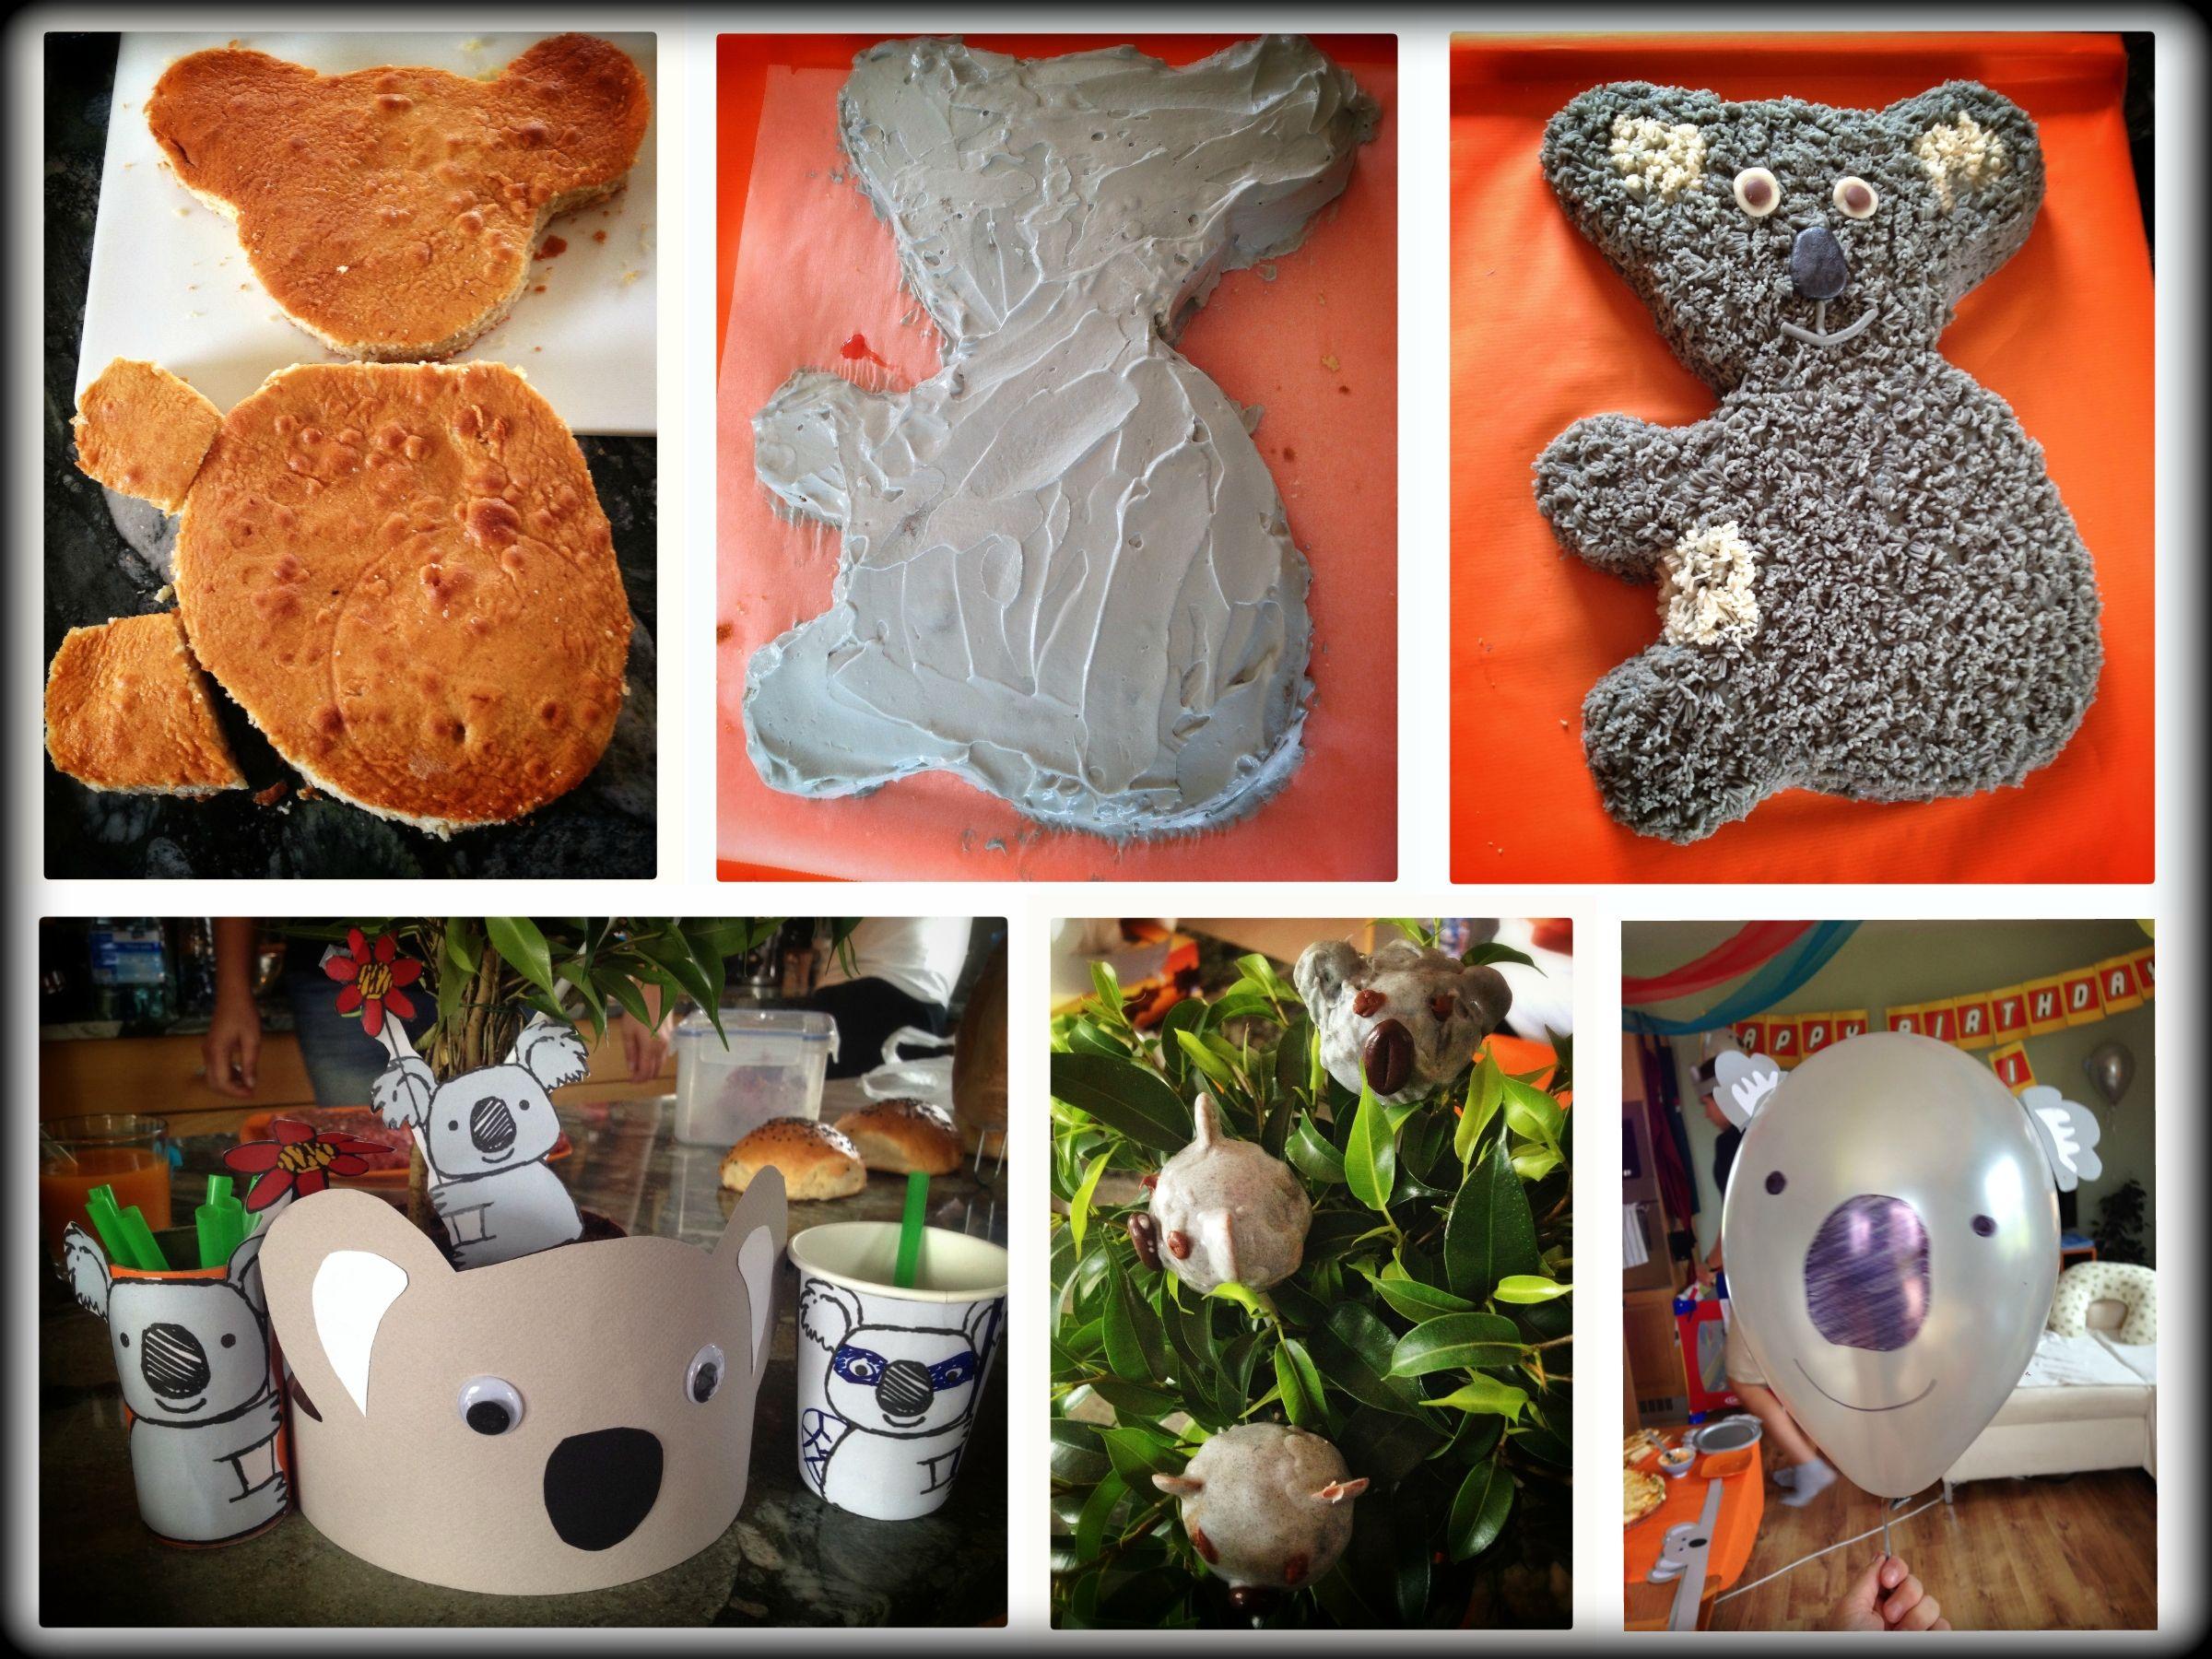 Koala Party for my koala freak bro: starring Koala CAKE, Koala ...